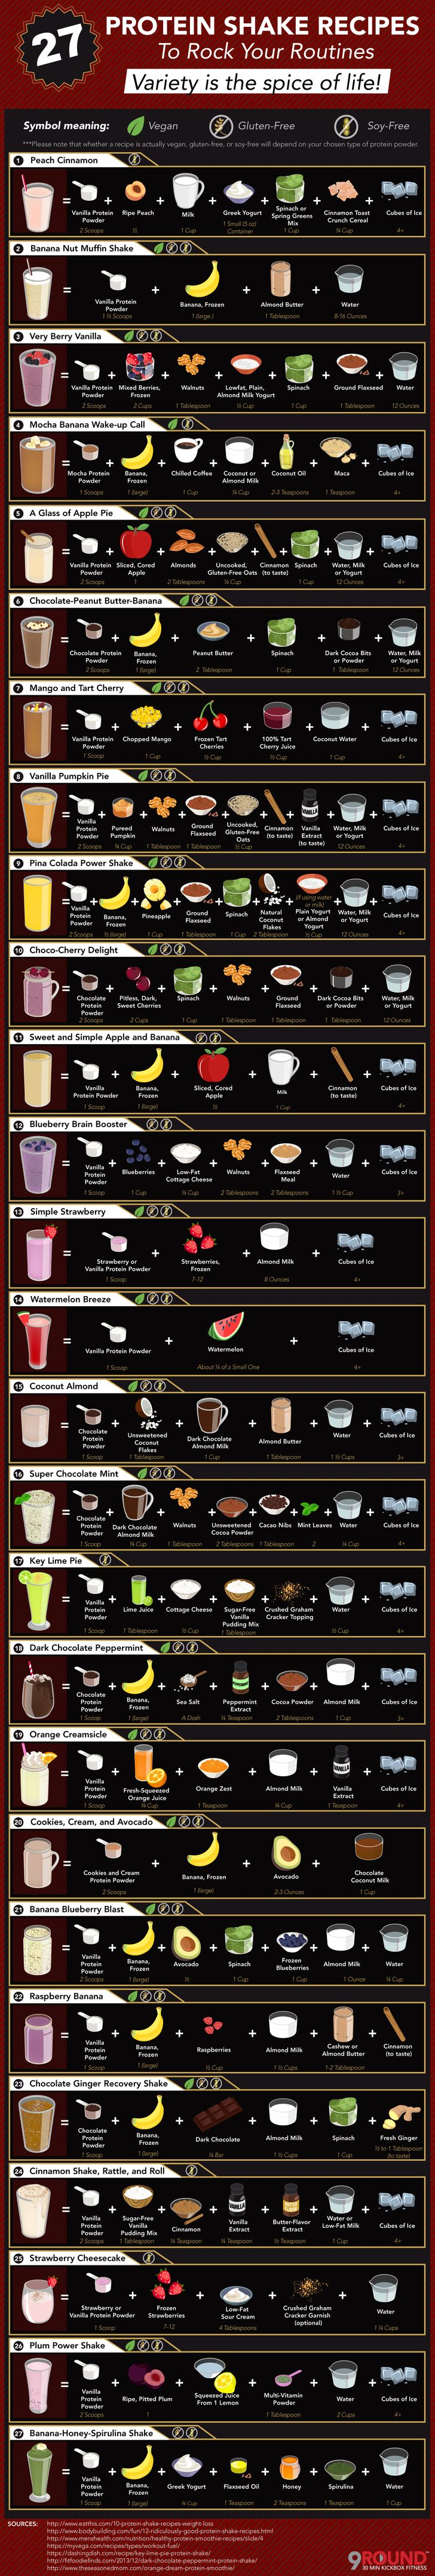 Healthy shakes - Imgur